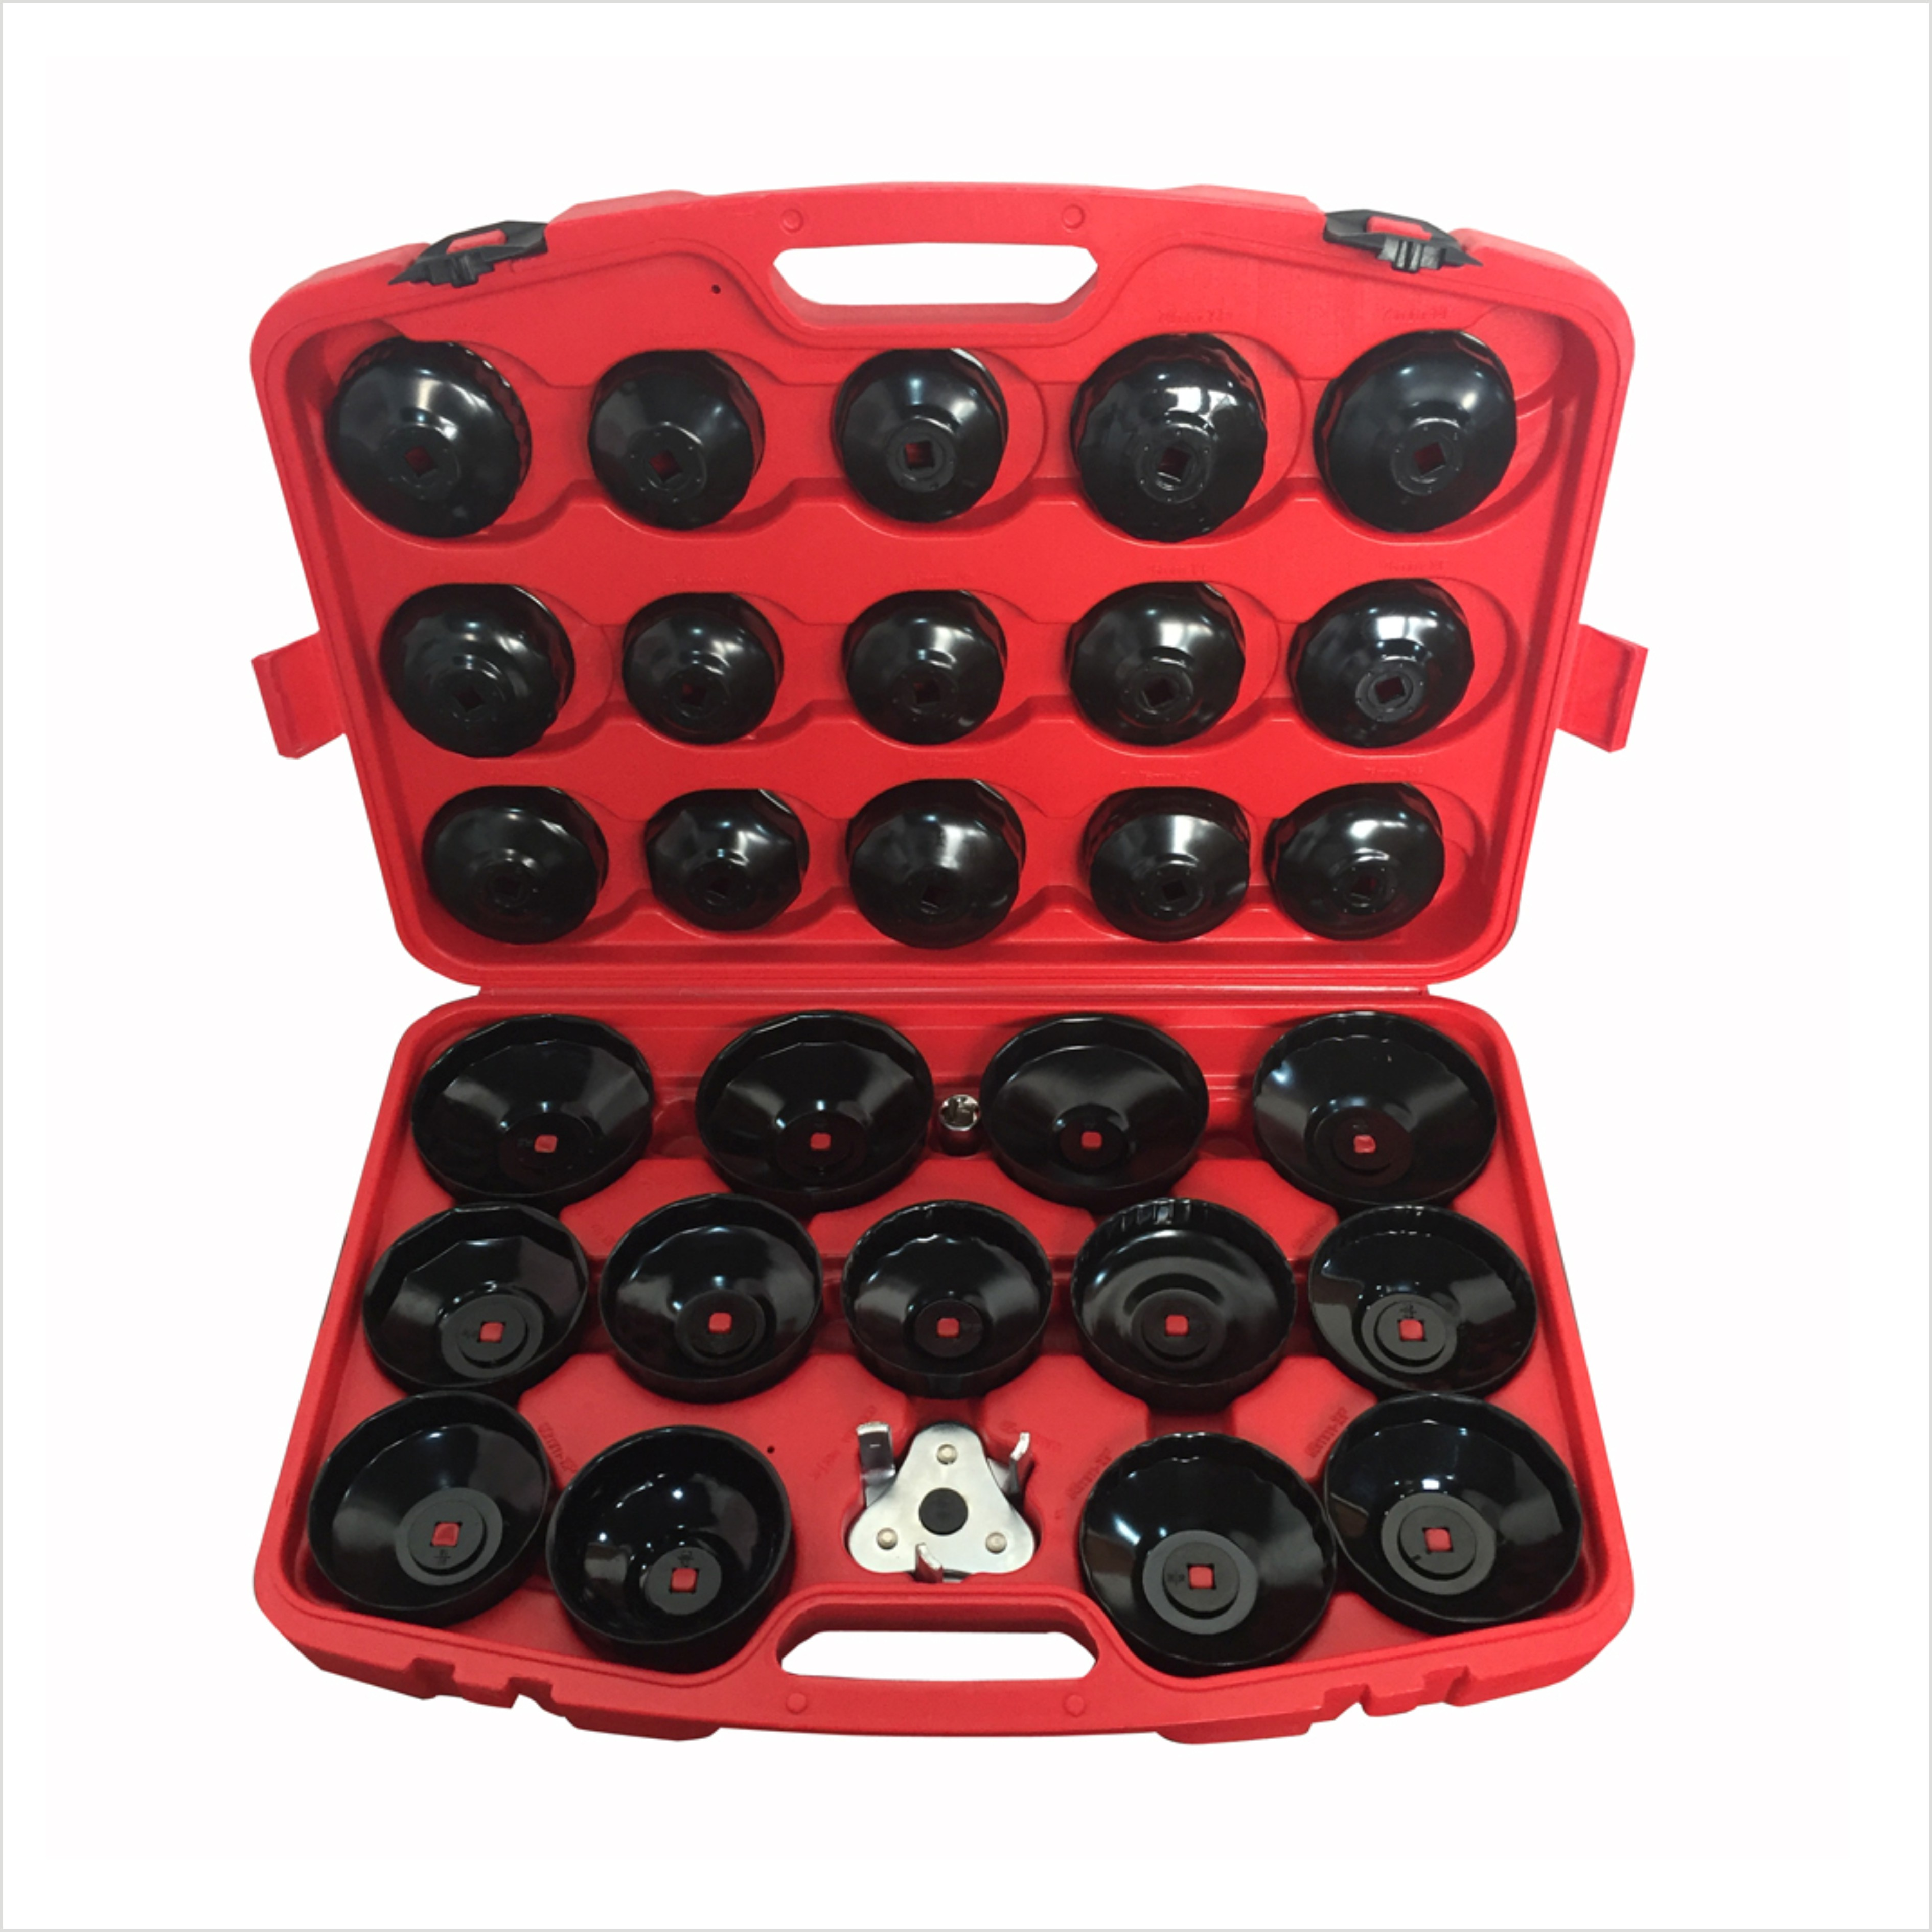 30pcs oil filter cap wrench cup socket tool set for for Mercedes benz oil filter cap wrench